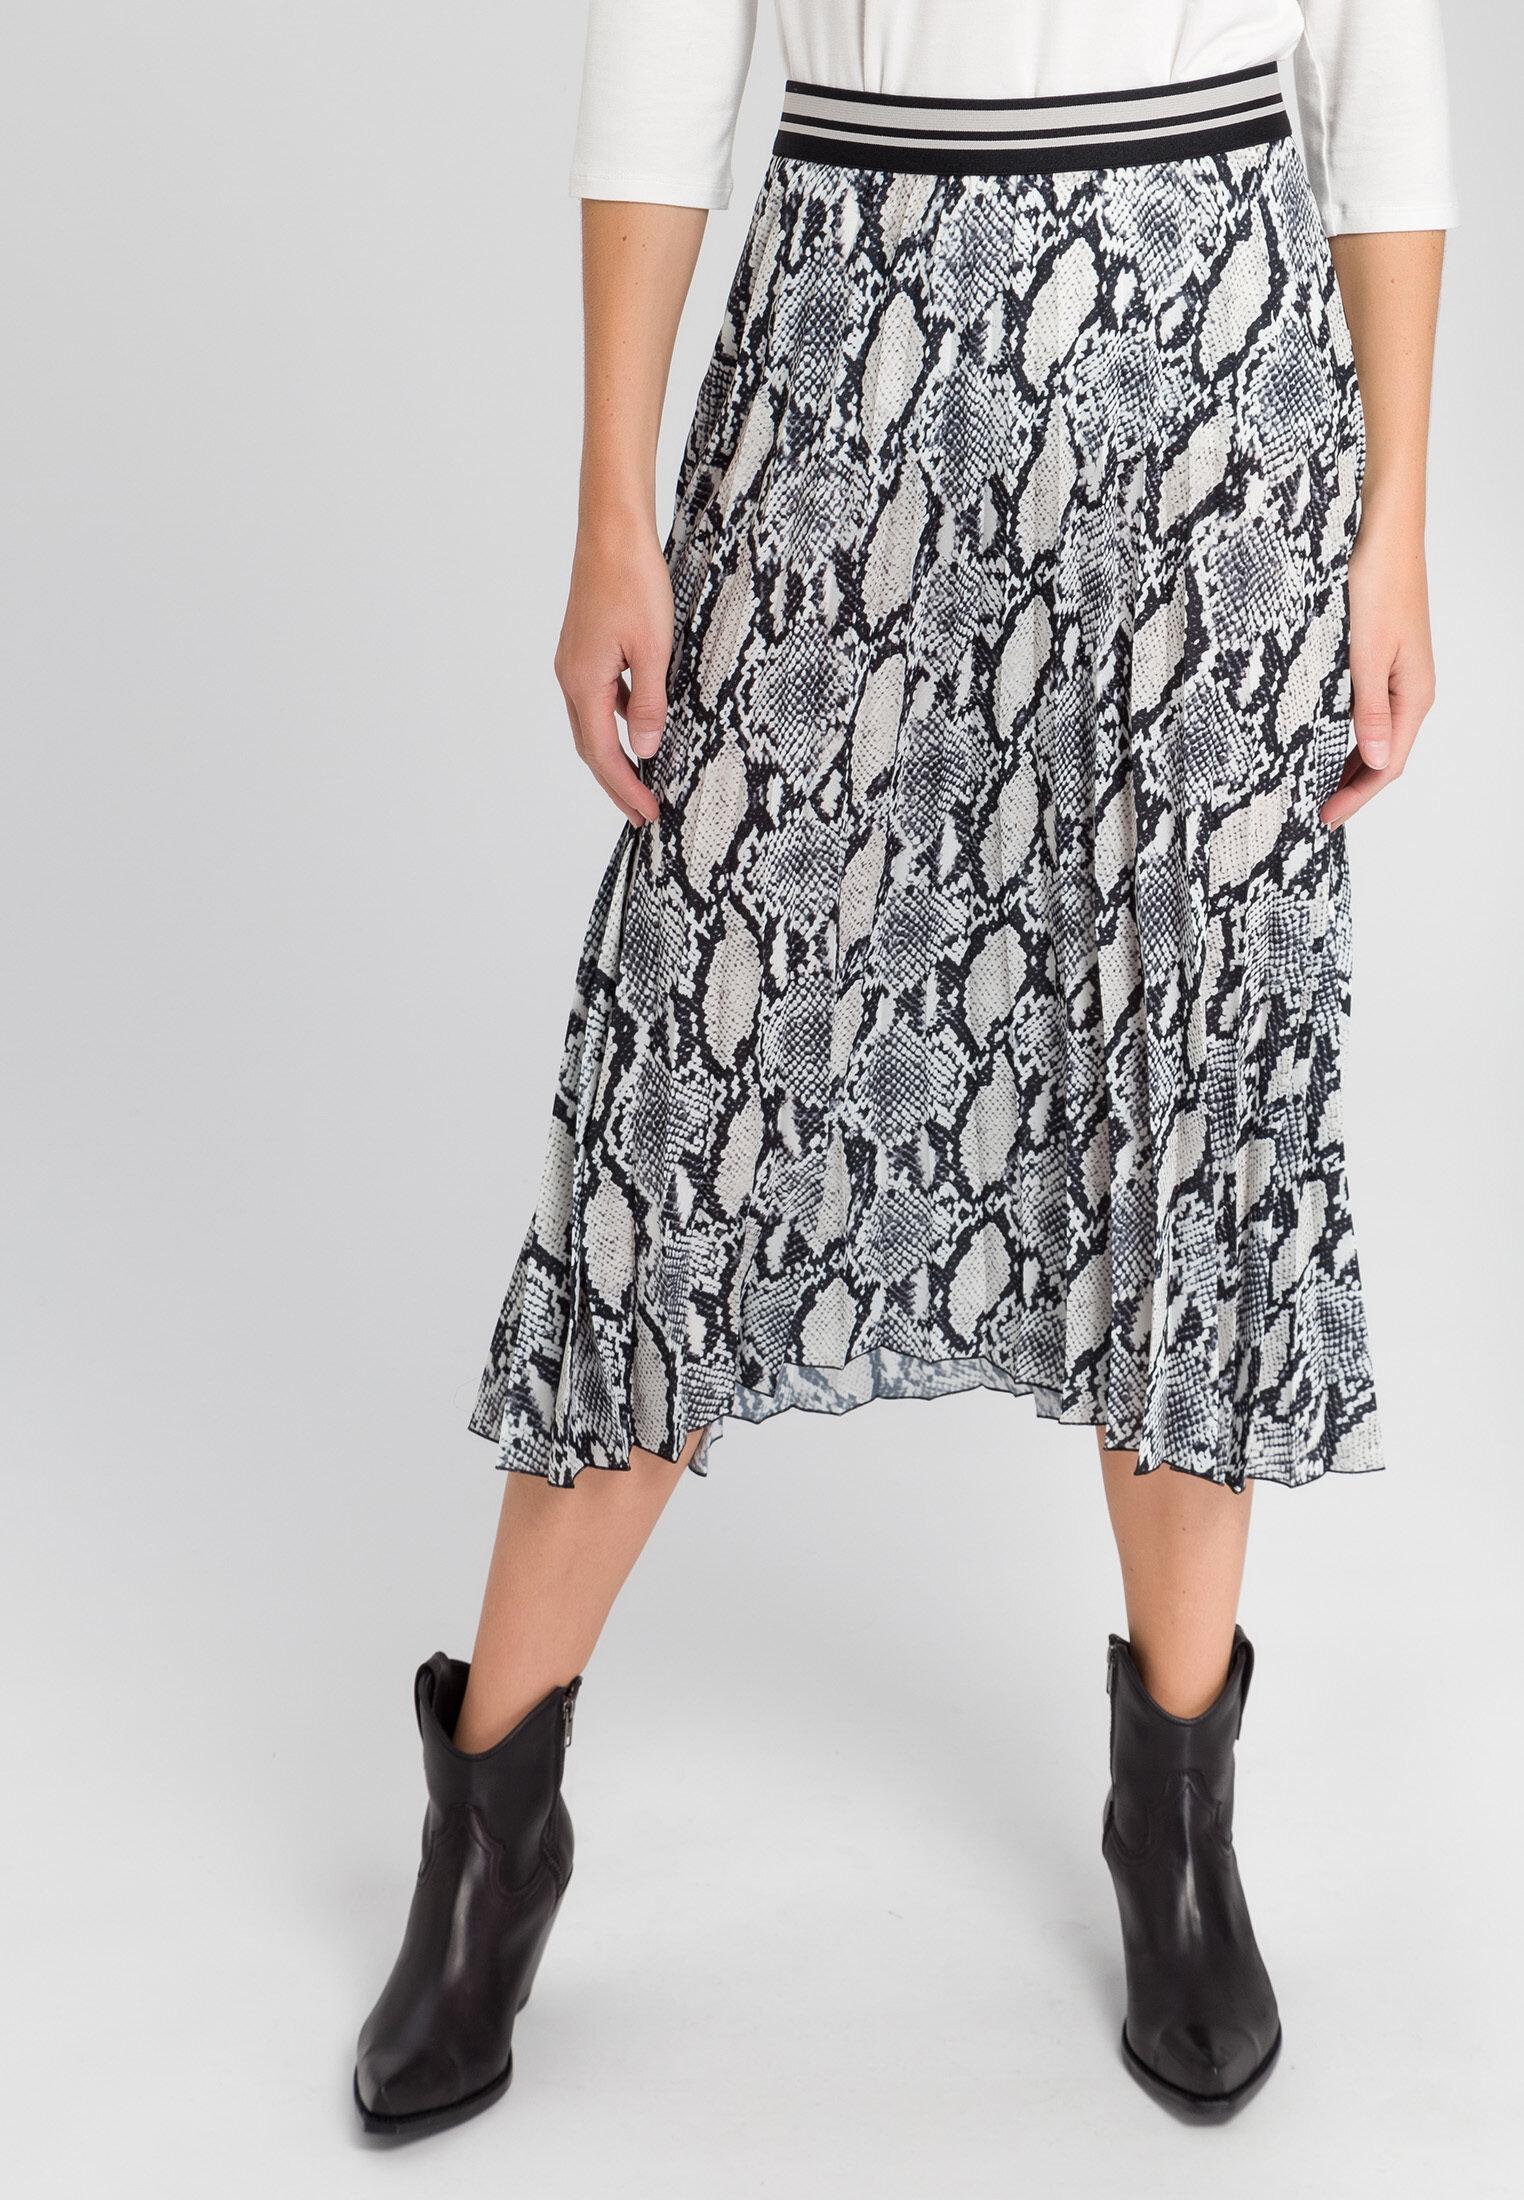 Marc Aurel snake print skirt